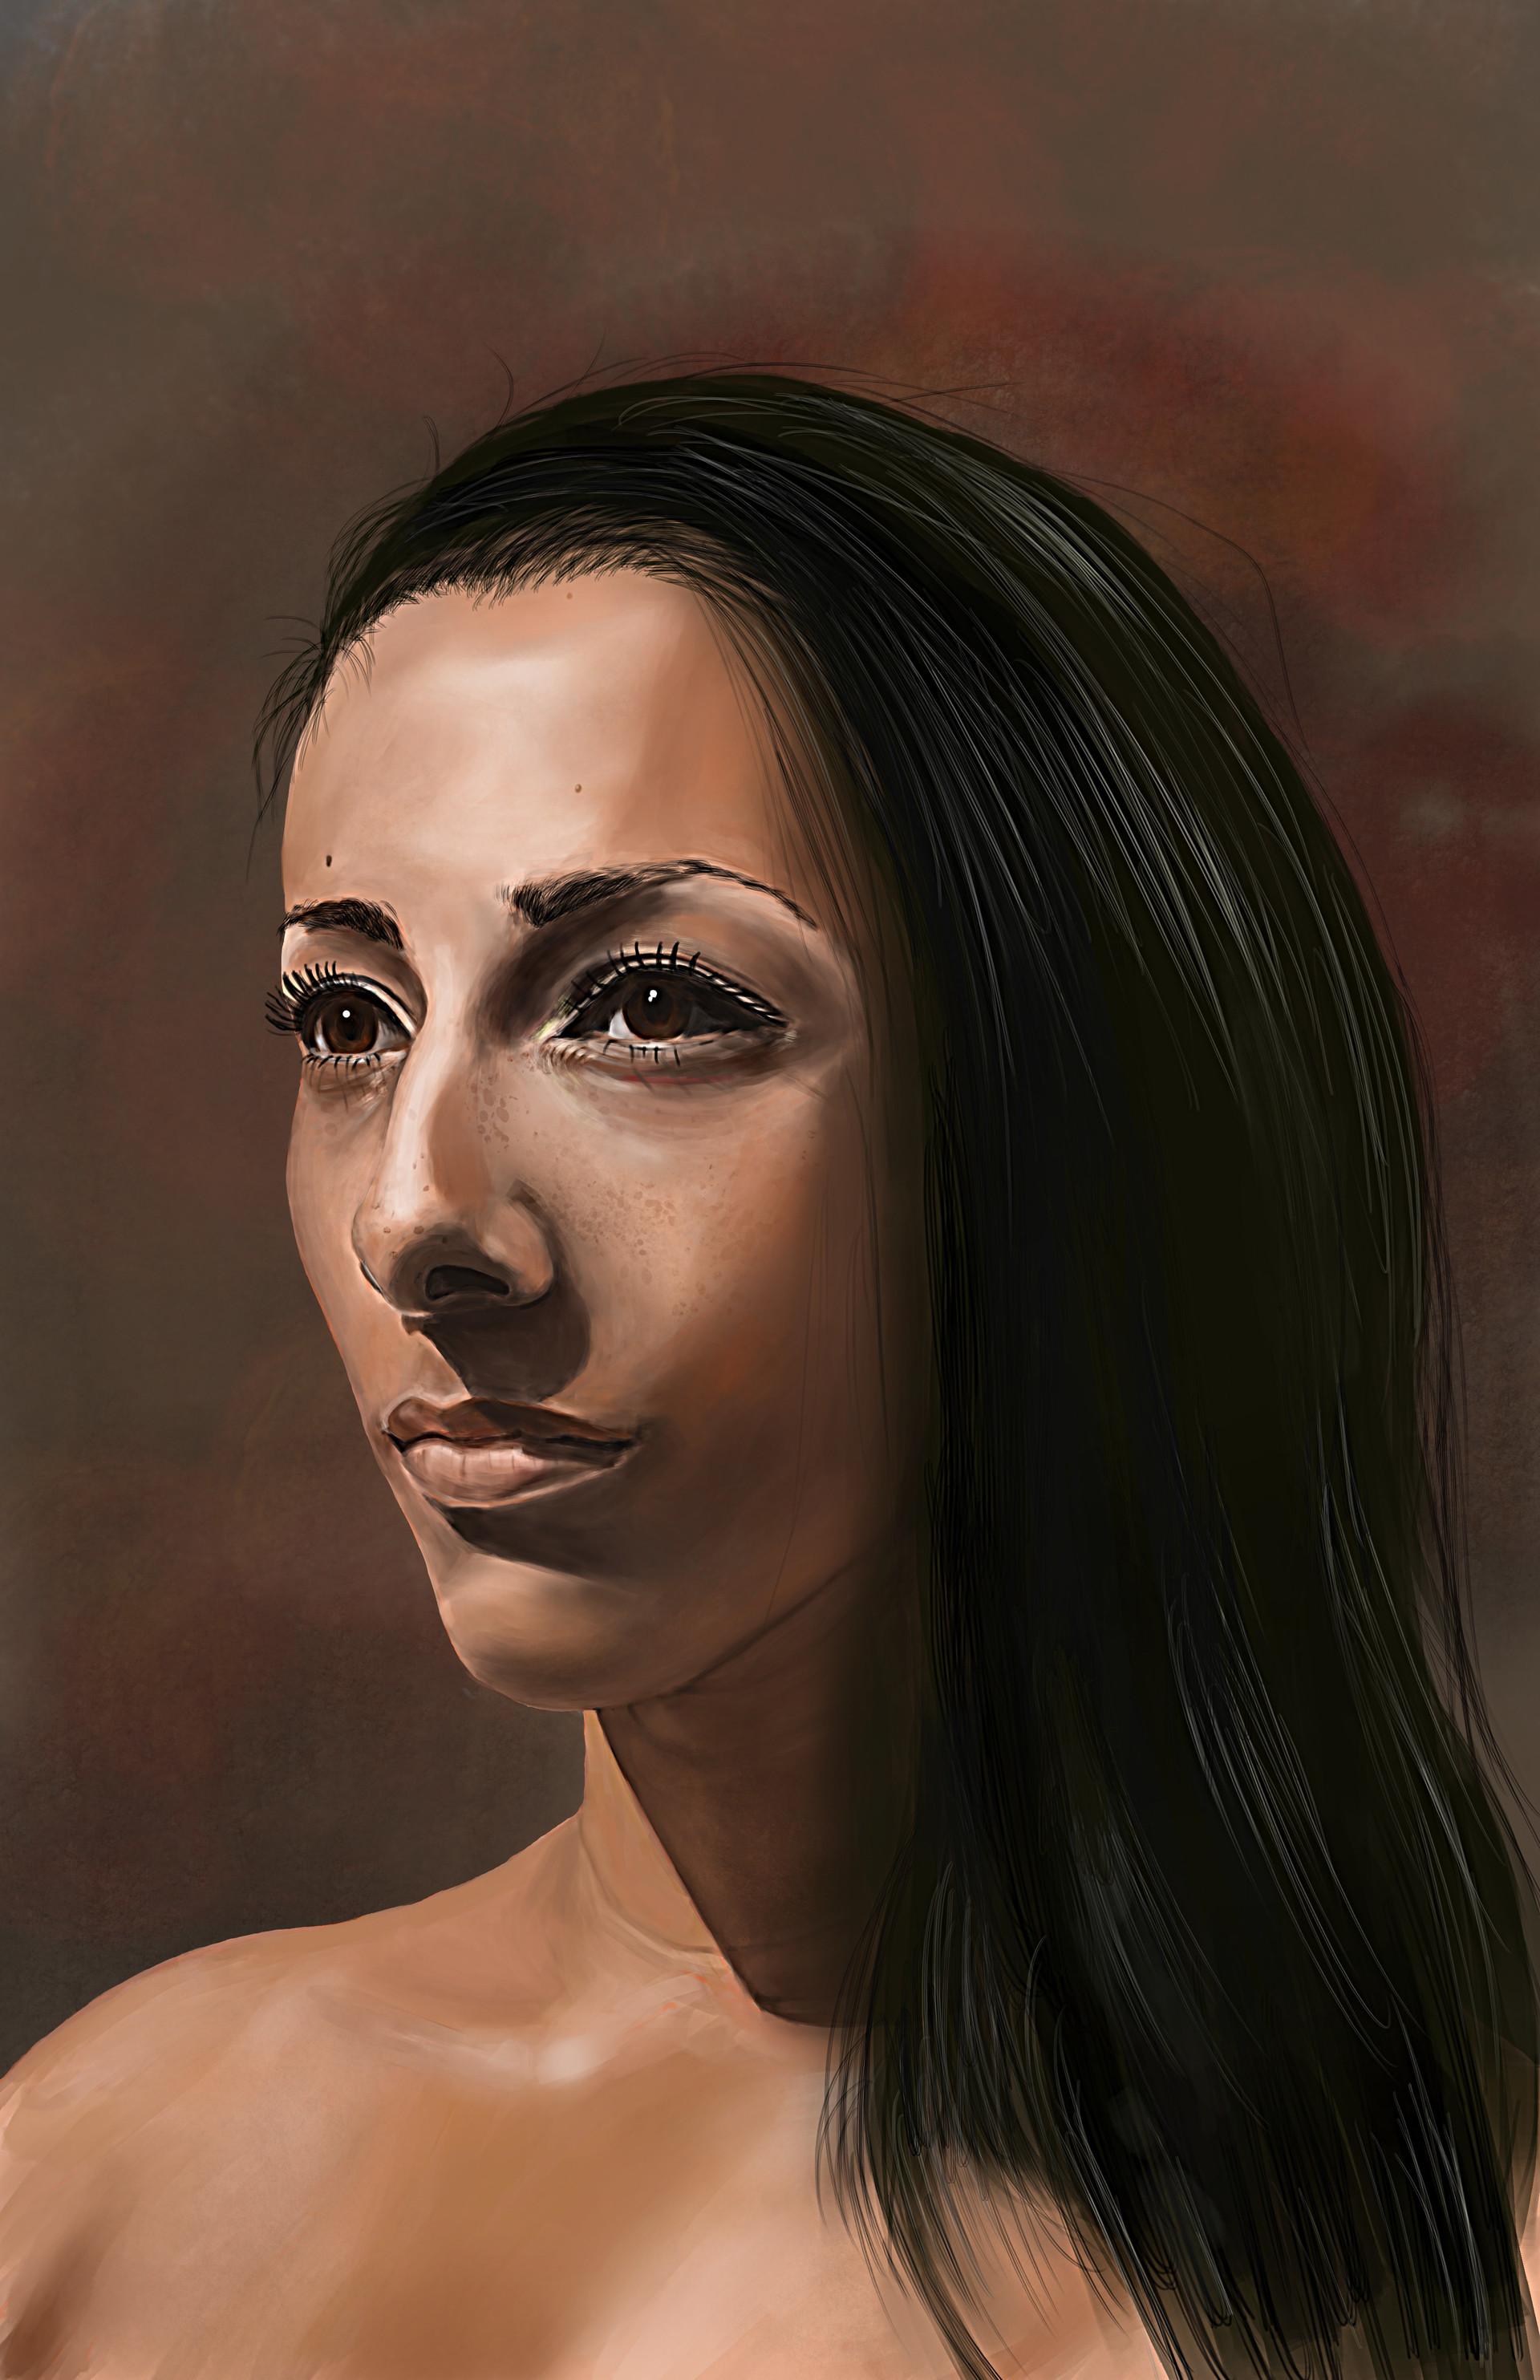 Chris qing qing zhao elements of digital painting portrait study 2